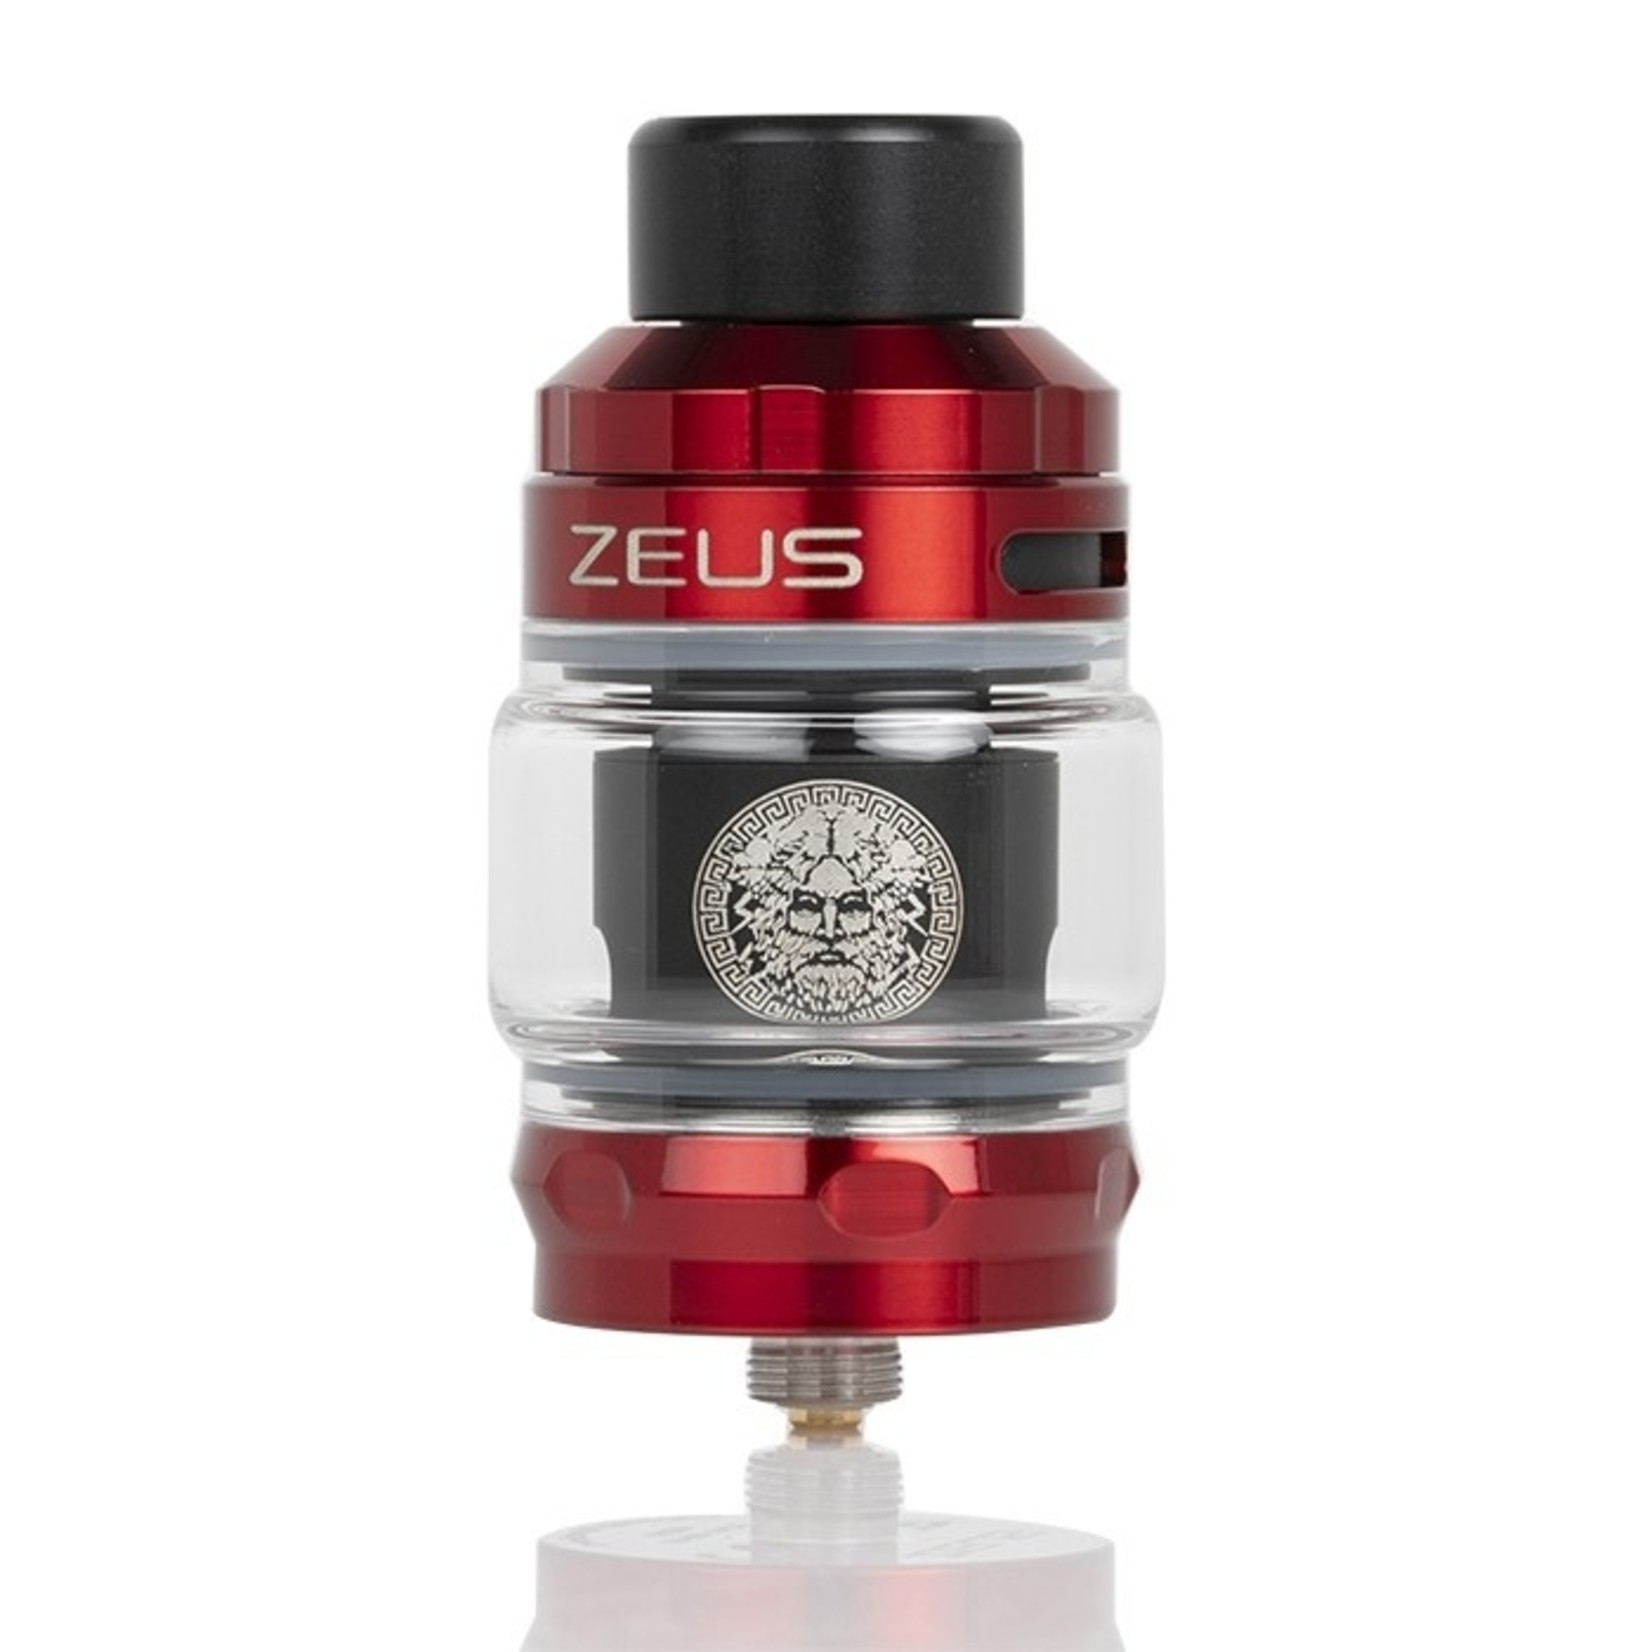 GeekVape Zeus Sub-Ohm 5ml Tank